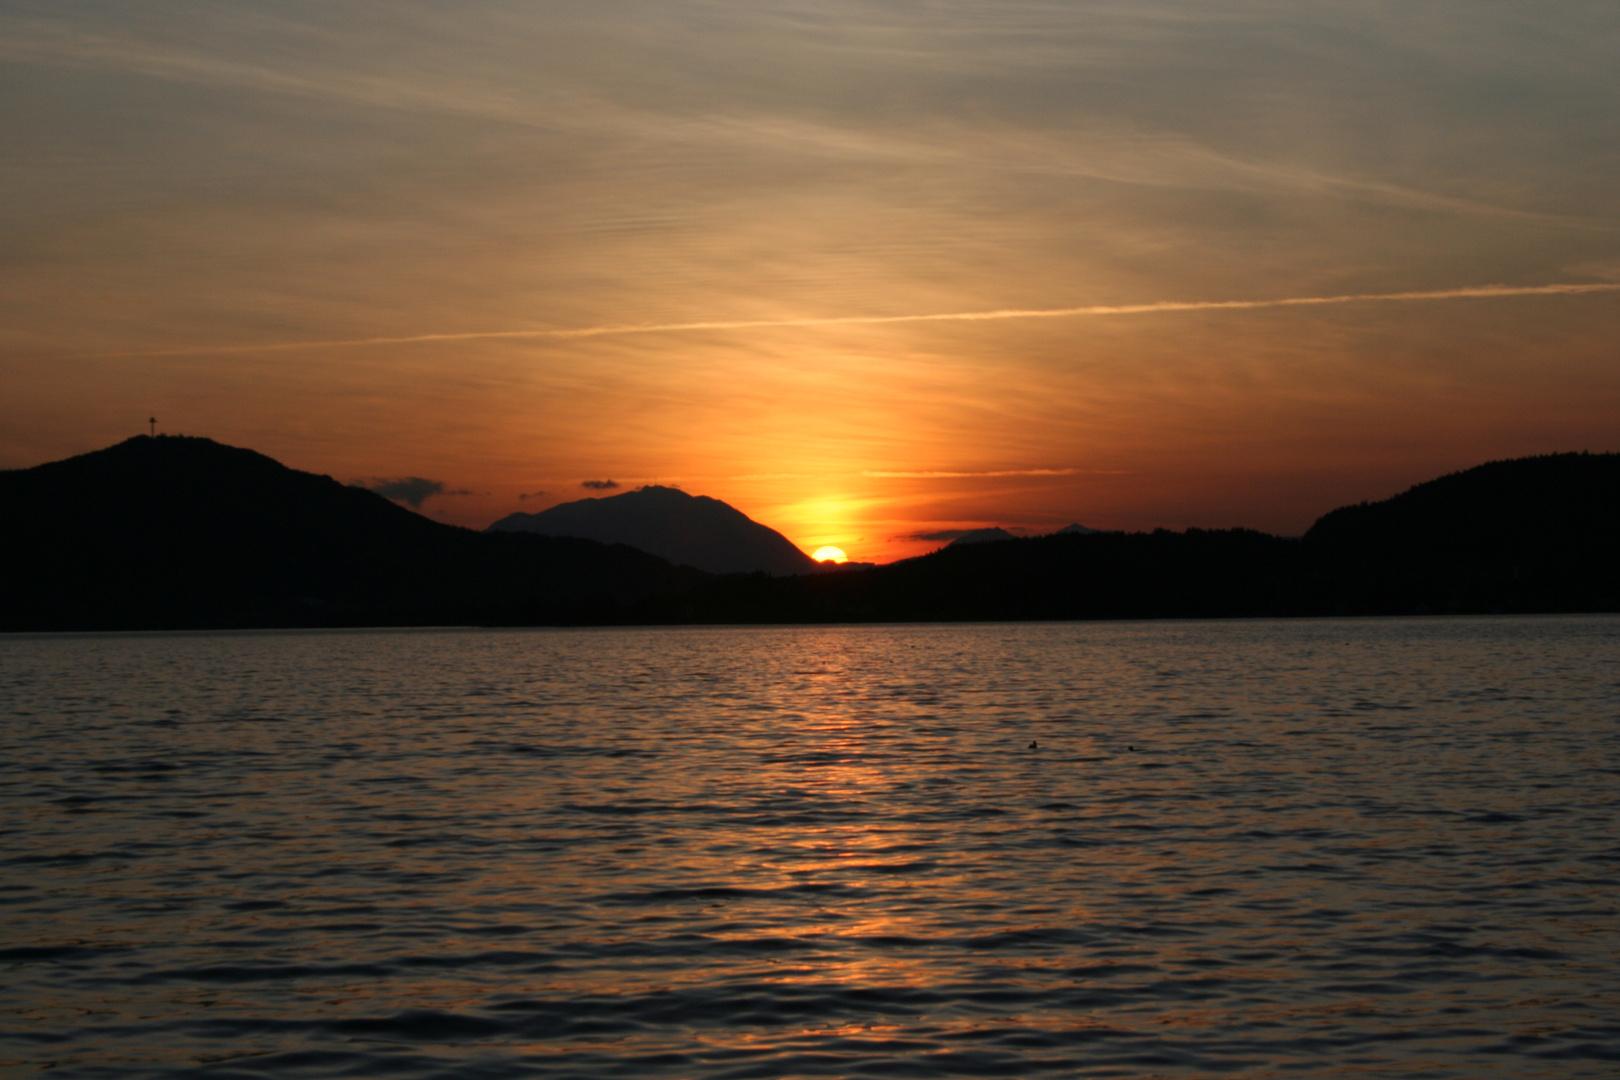 sunset_simple